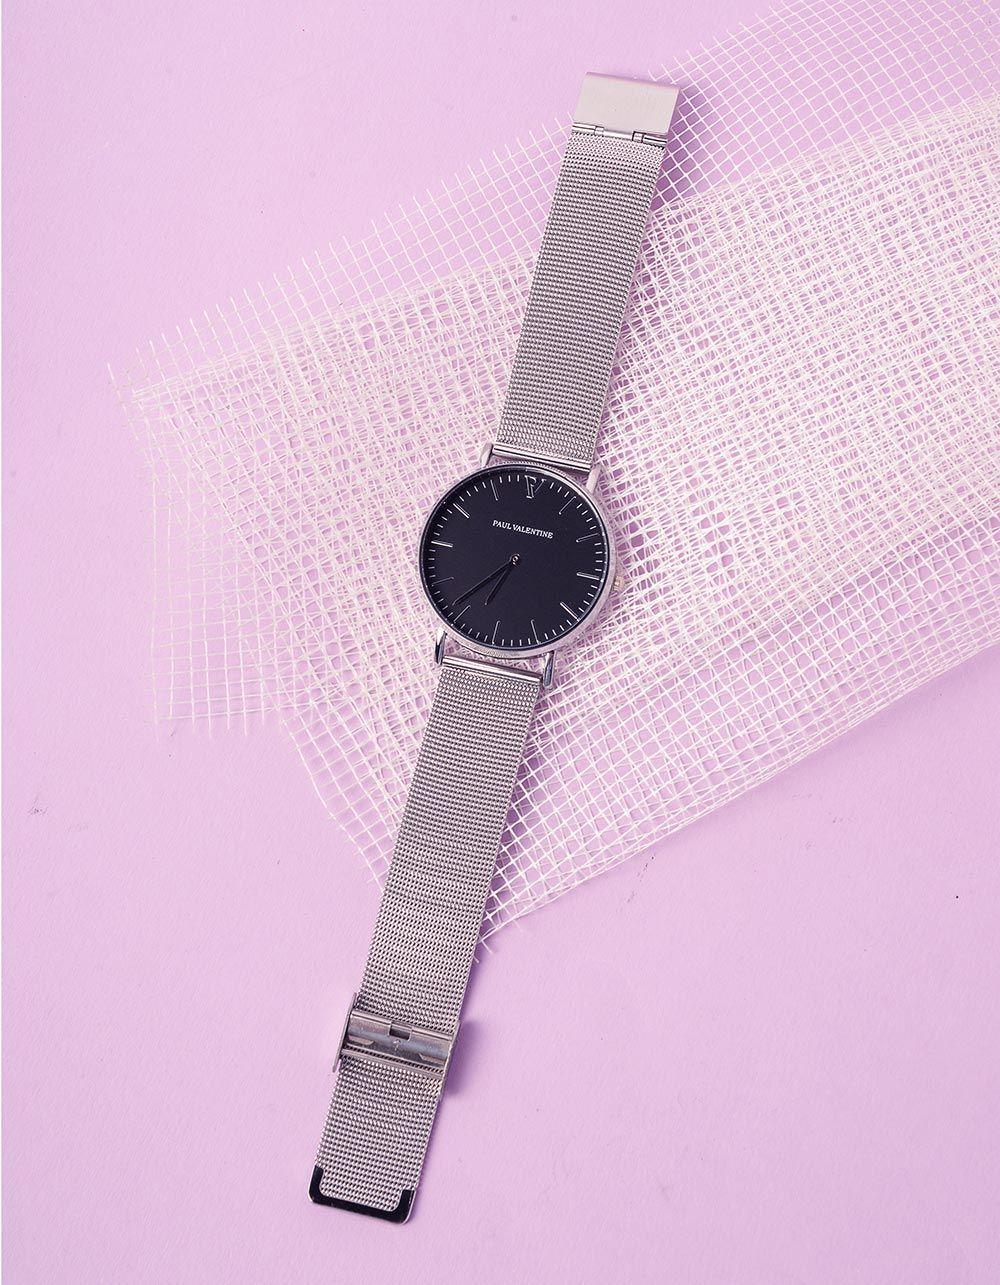 Годинник на руку з круглим циферблатом | 237302-07-XX